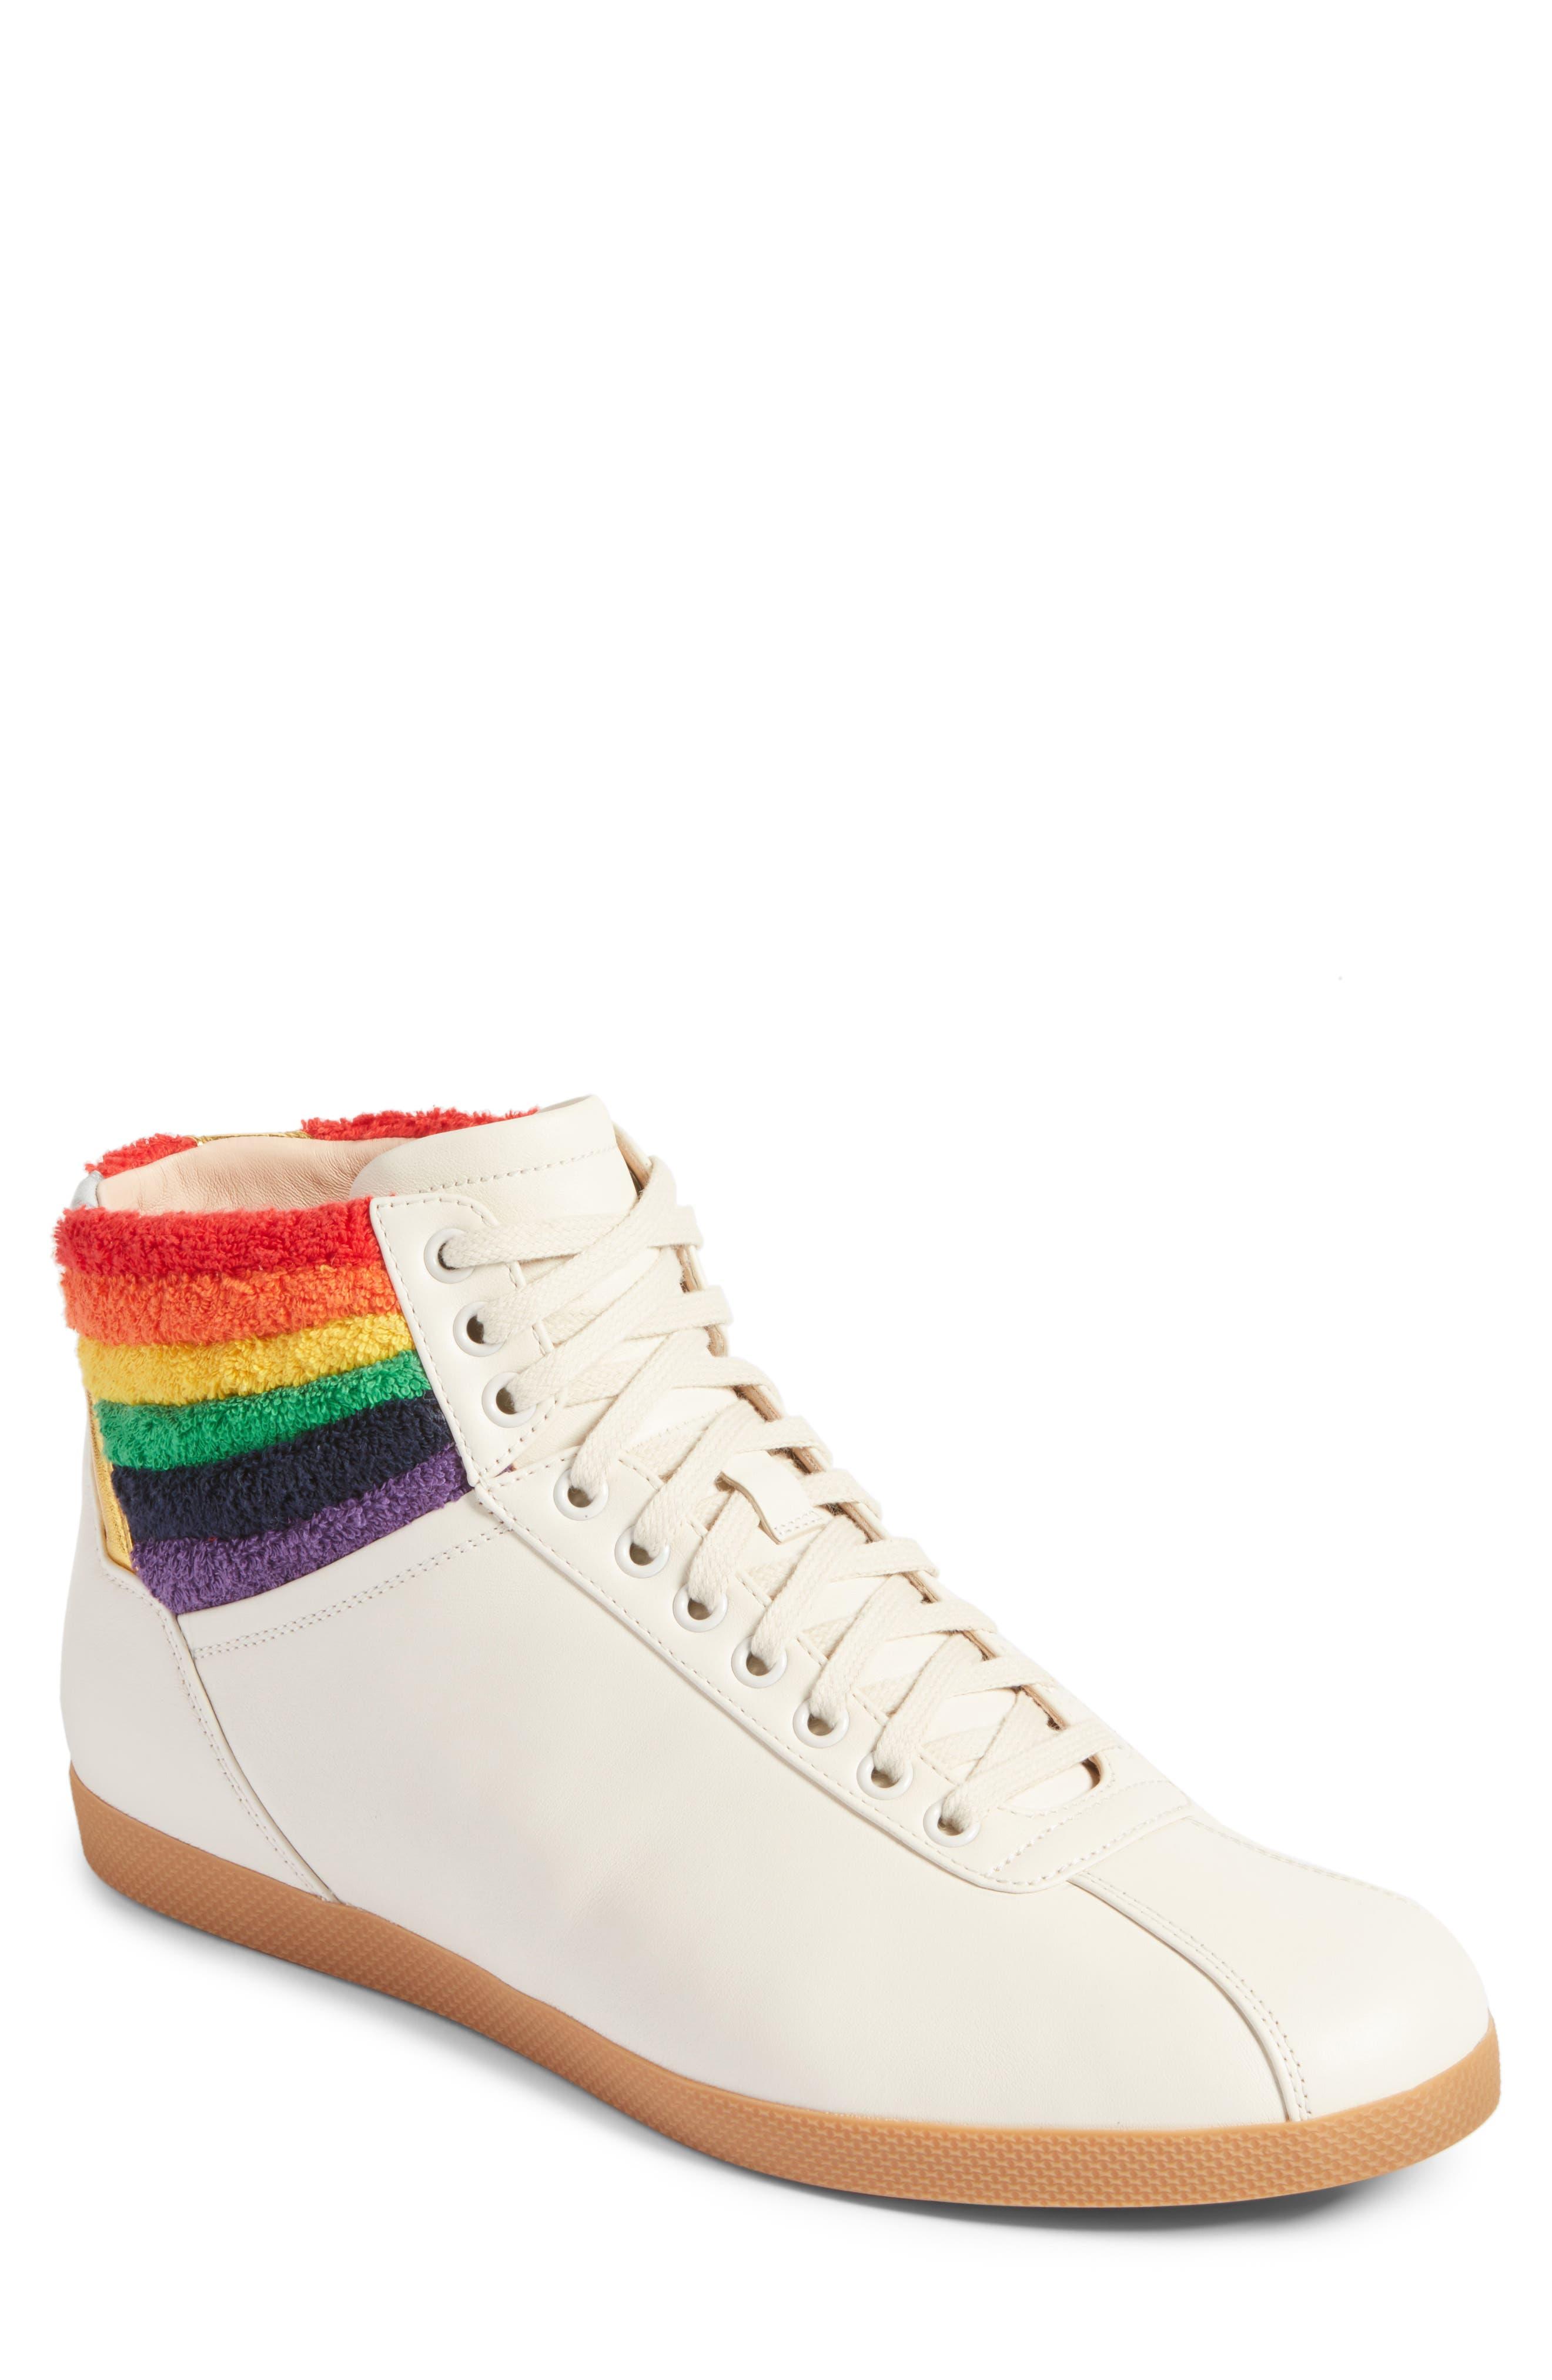 Bambi Rainbow Terry High Top Sneaker,                         Main,                         color,